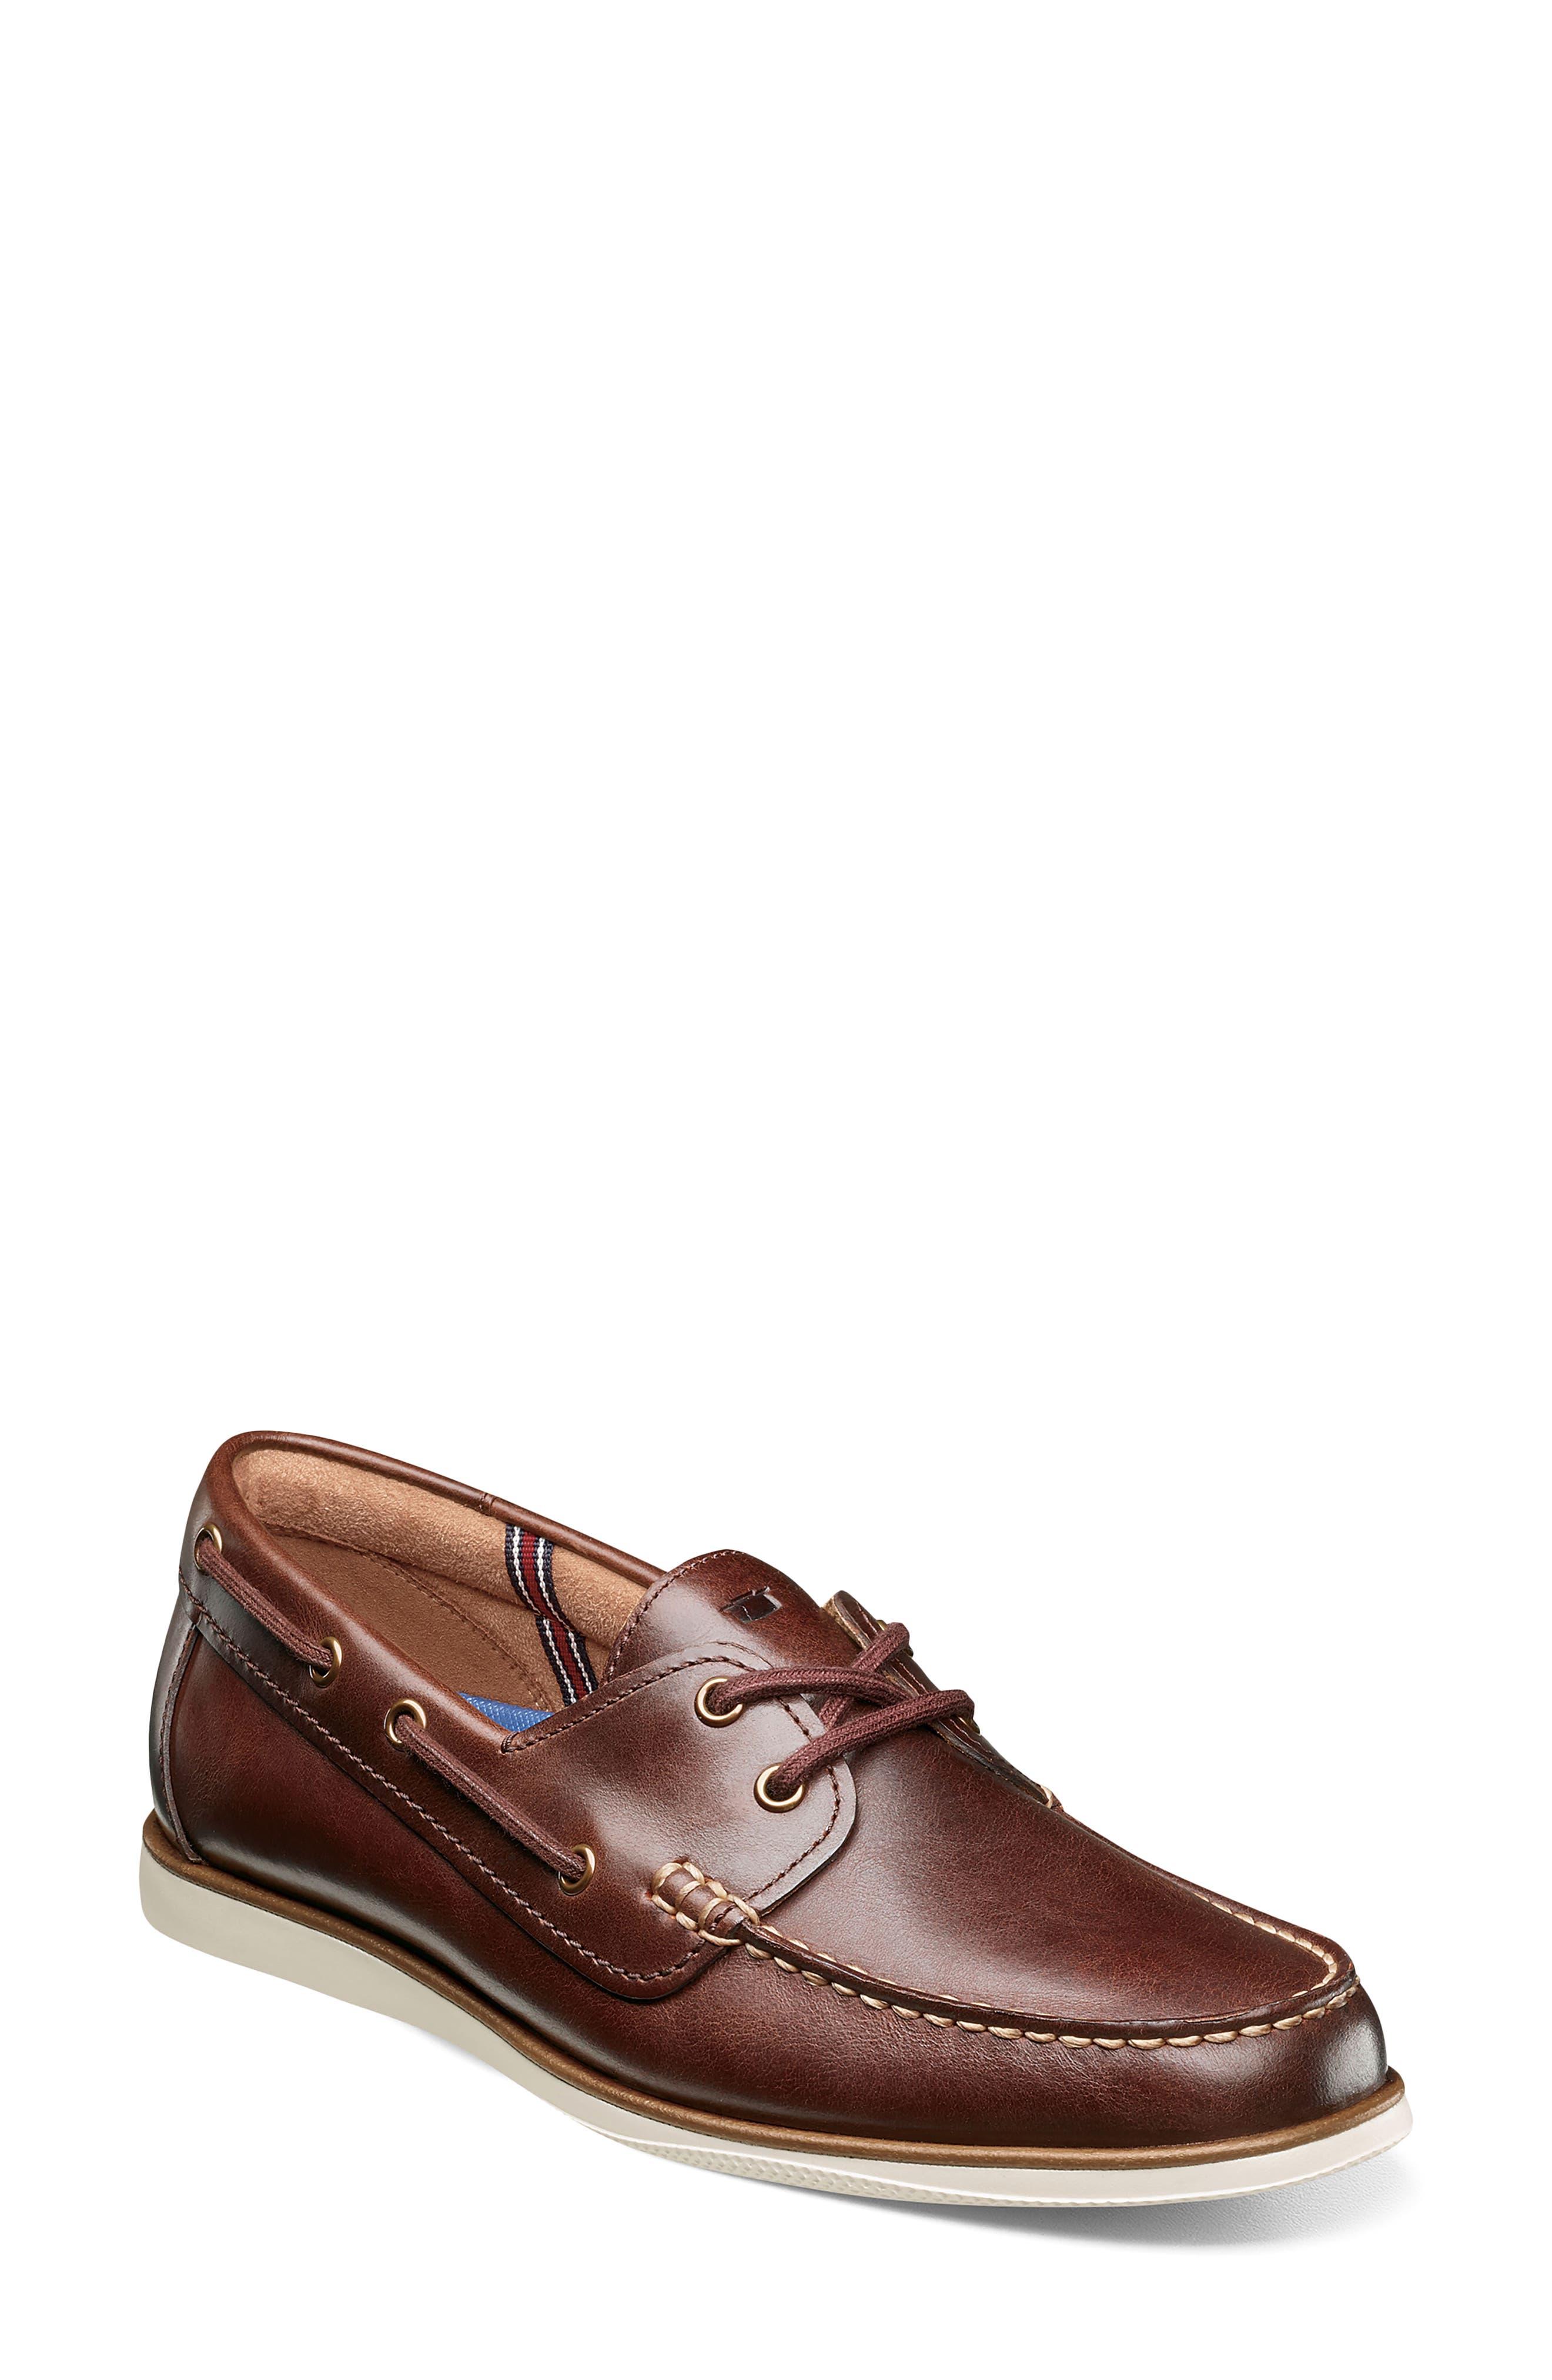 Atlantic Boat Shoe